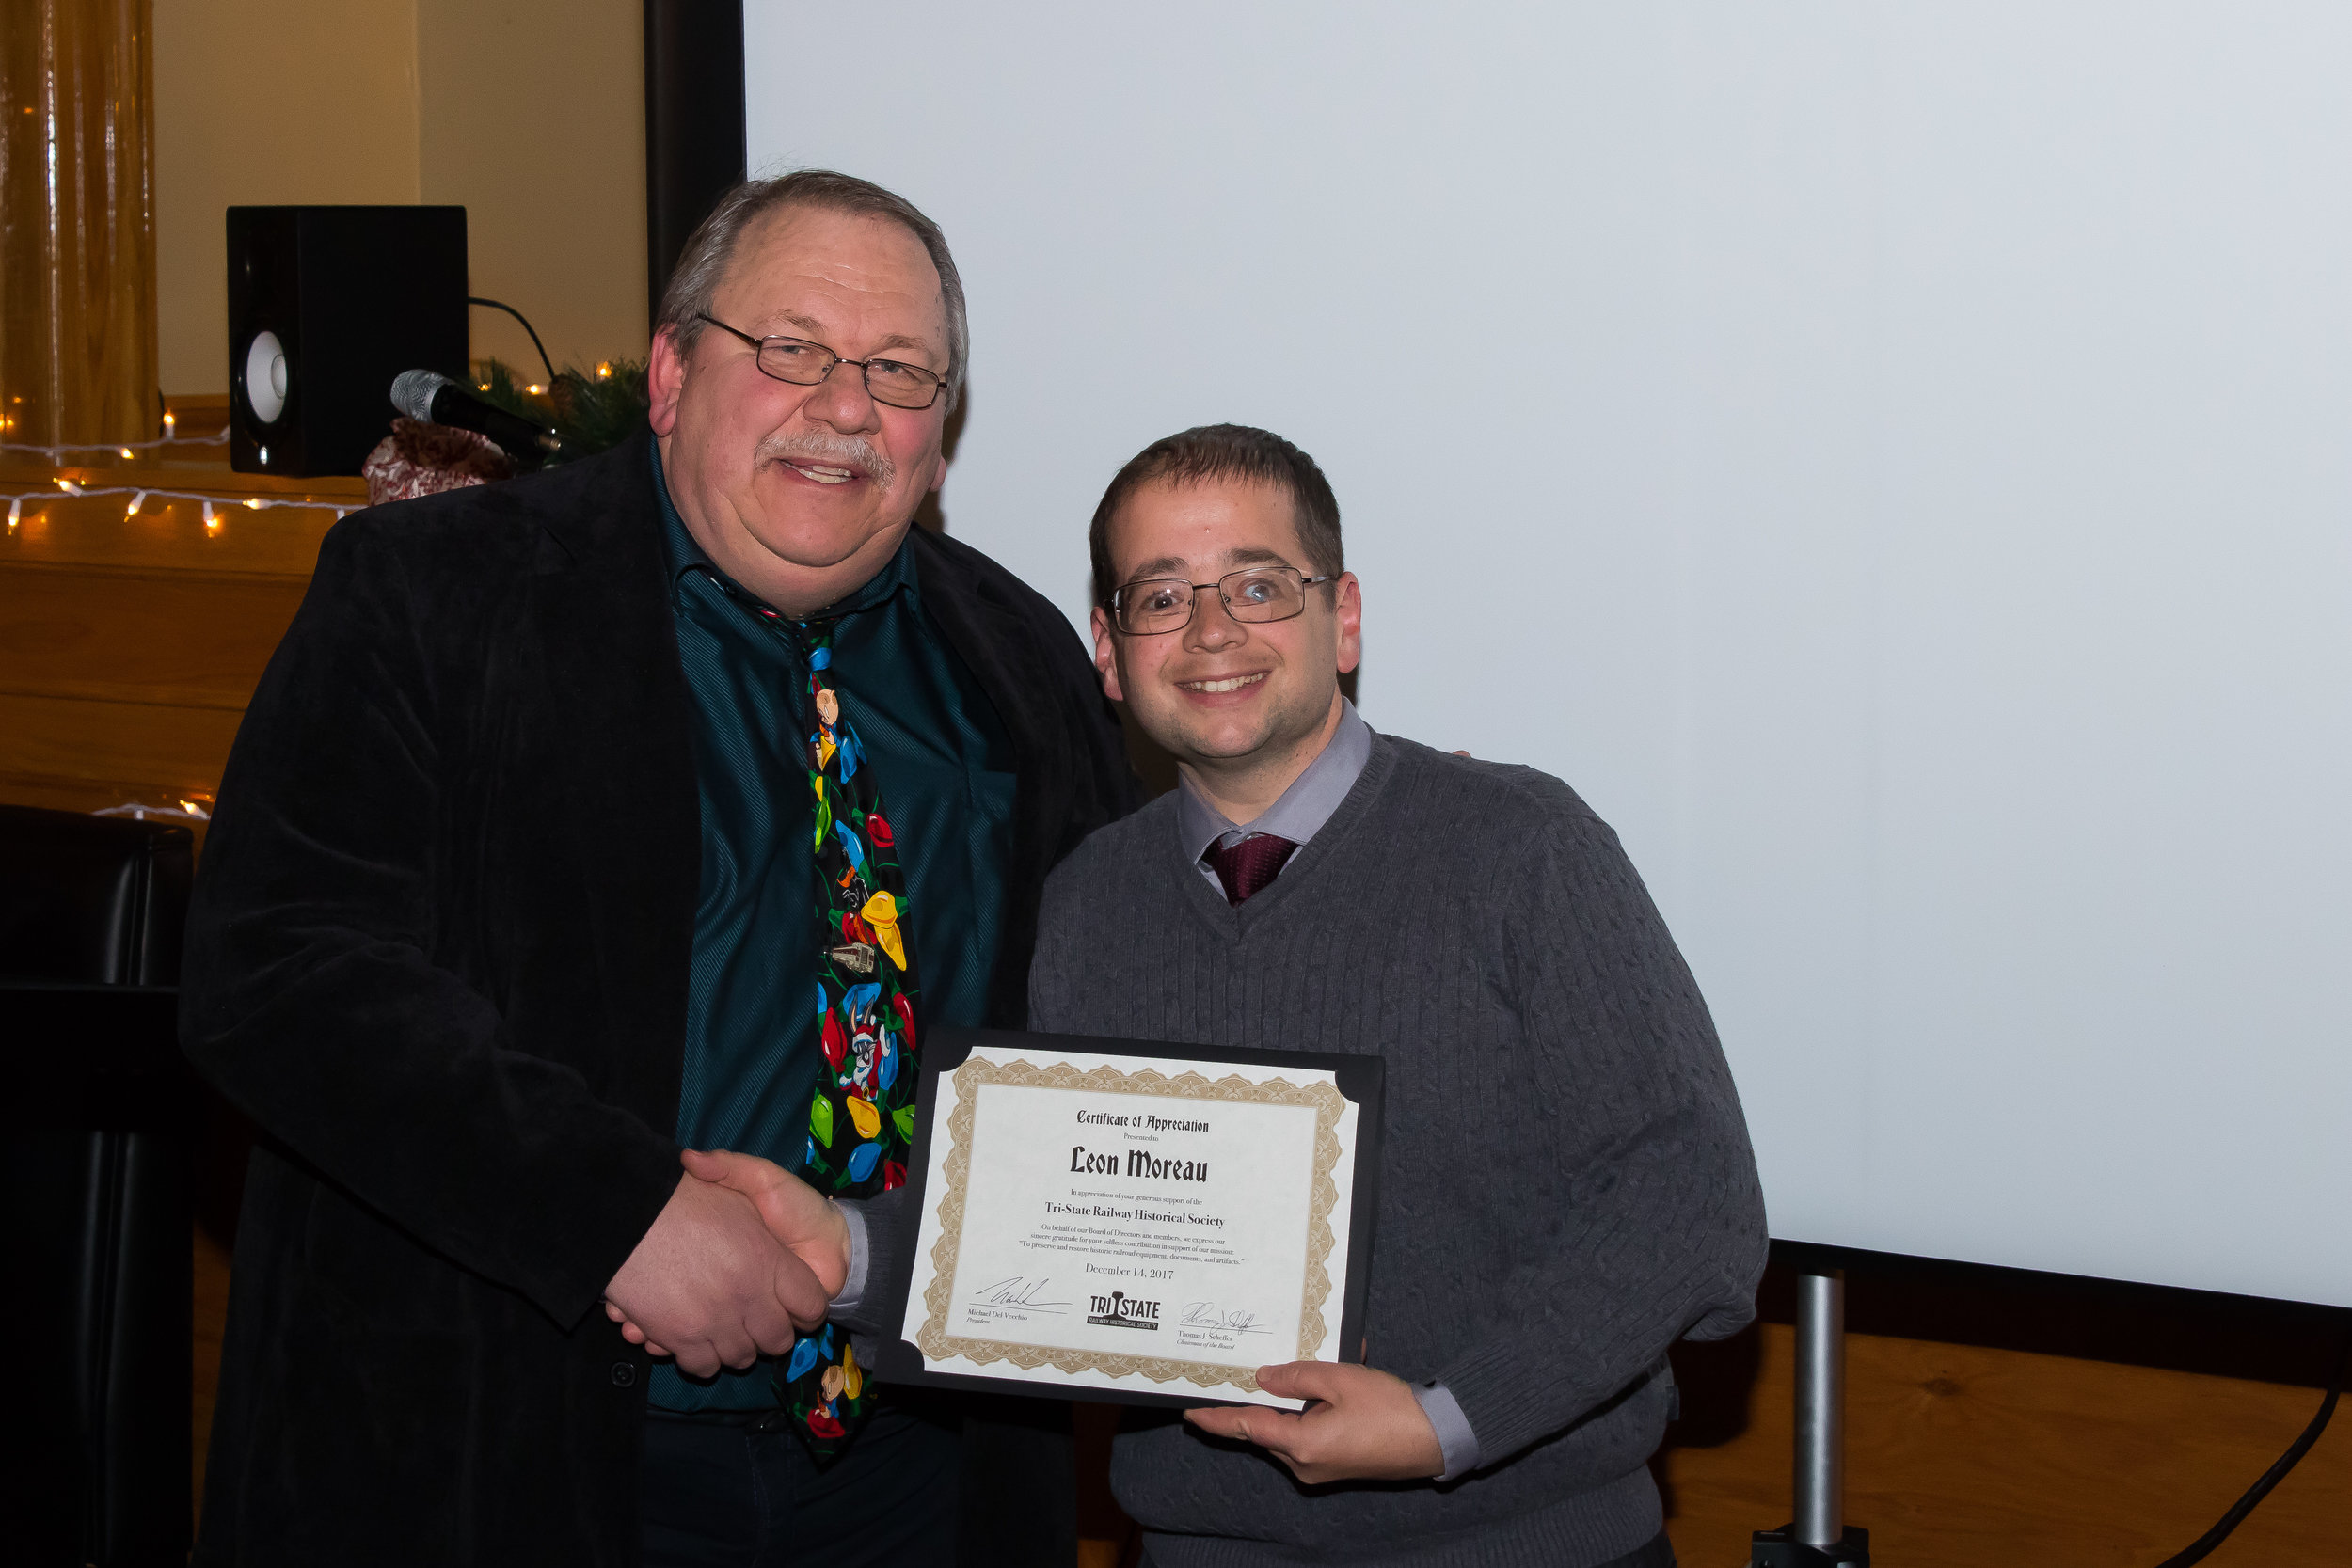 Member Leon Moreau receives a donor Certificate of Appreciation